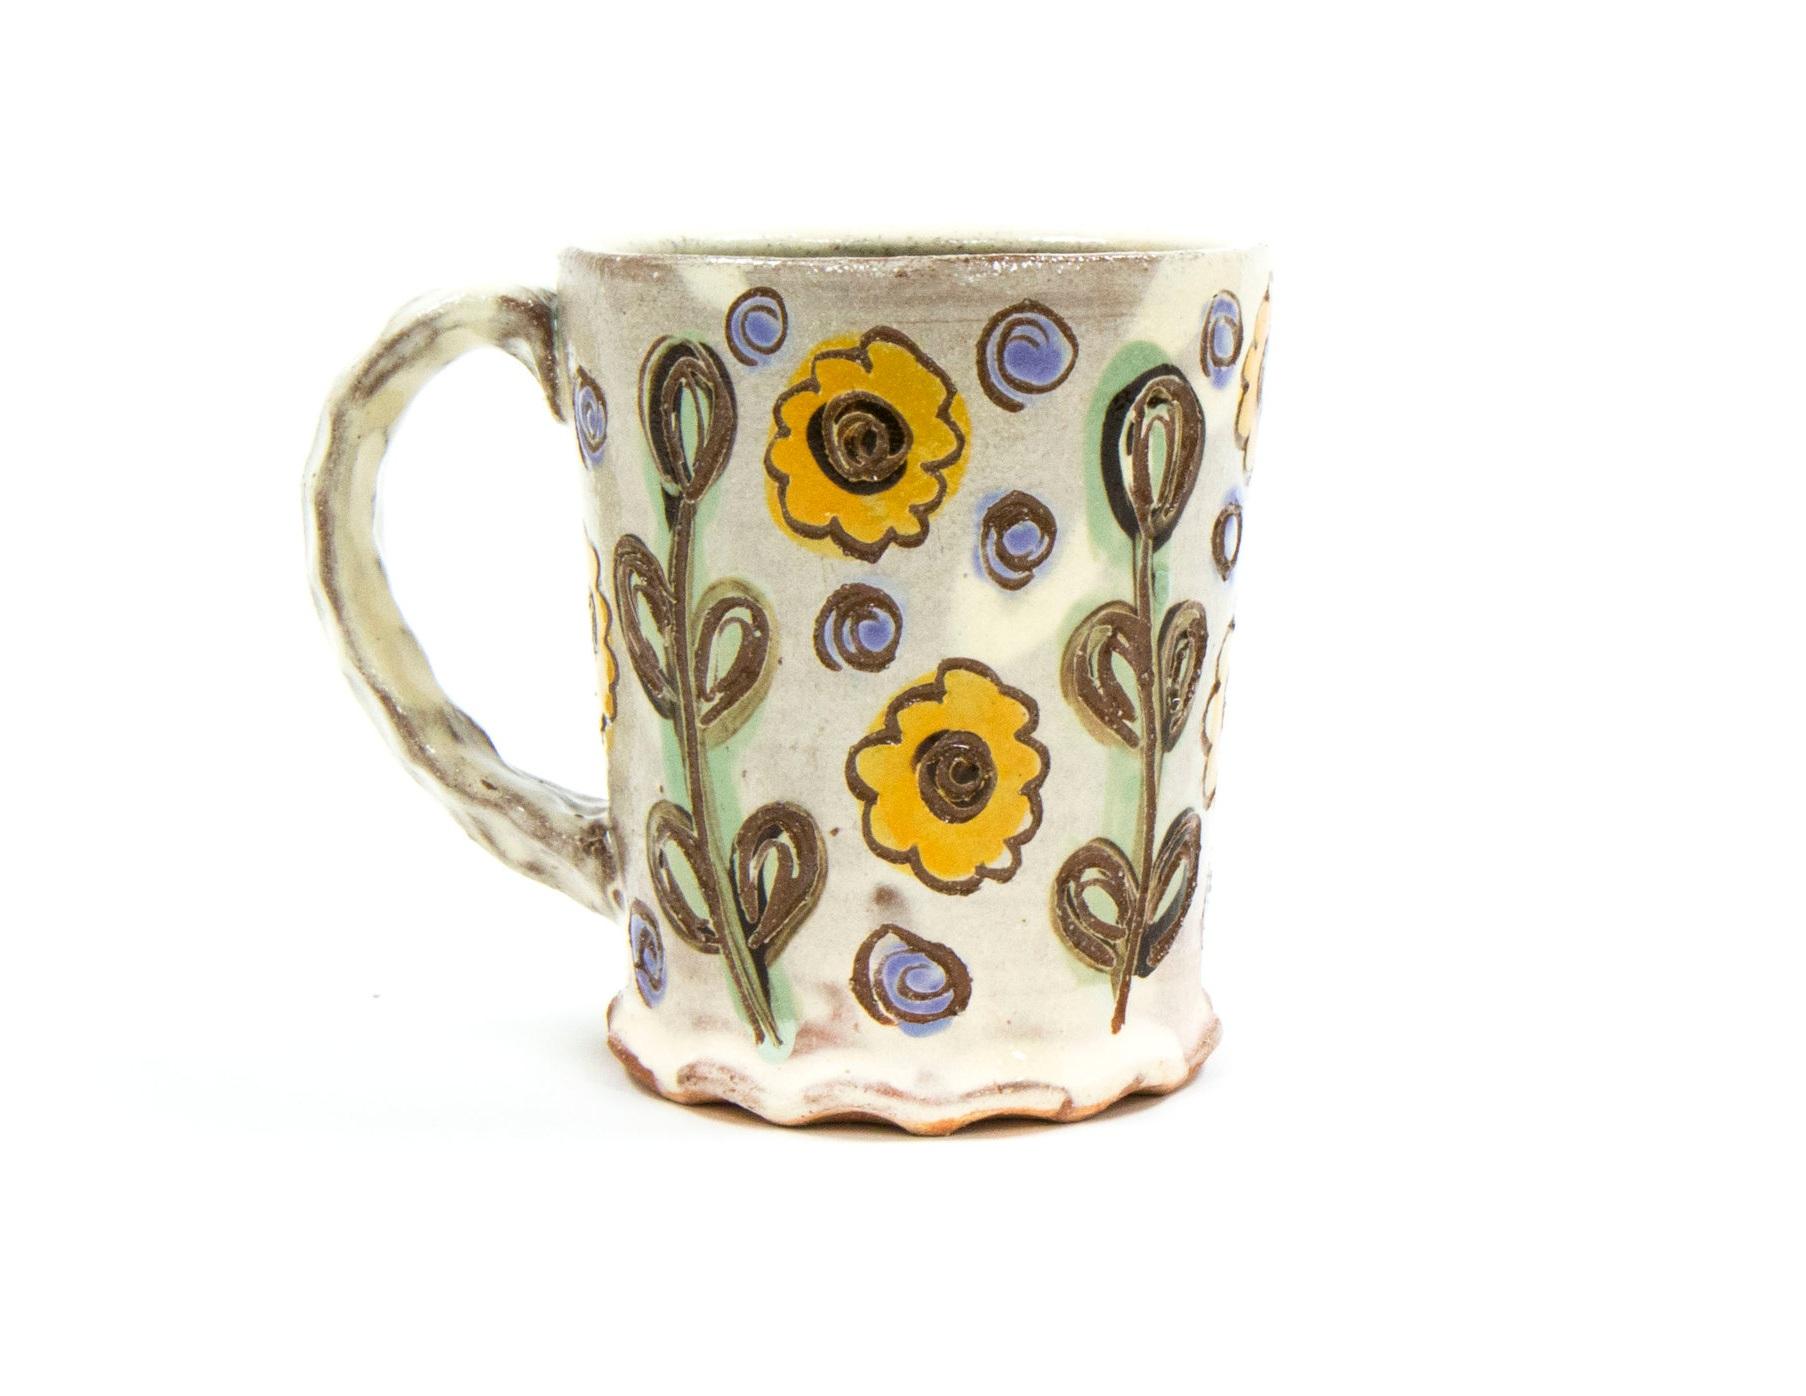 Floral Mug, Terracotta, Δ3 Oxidation, 2019